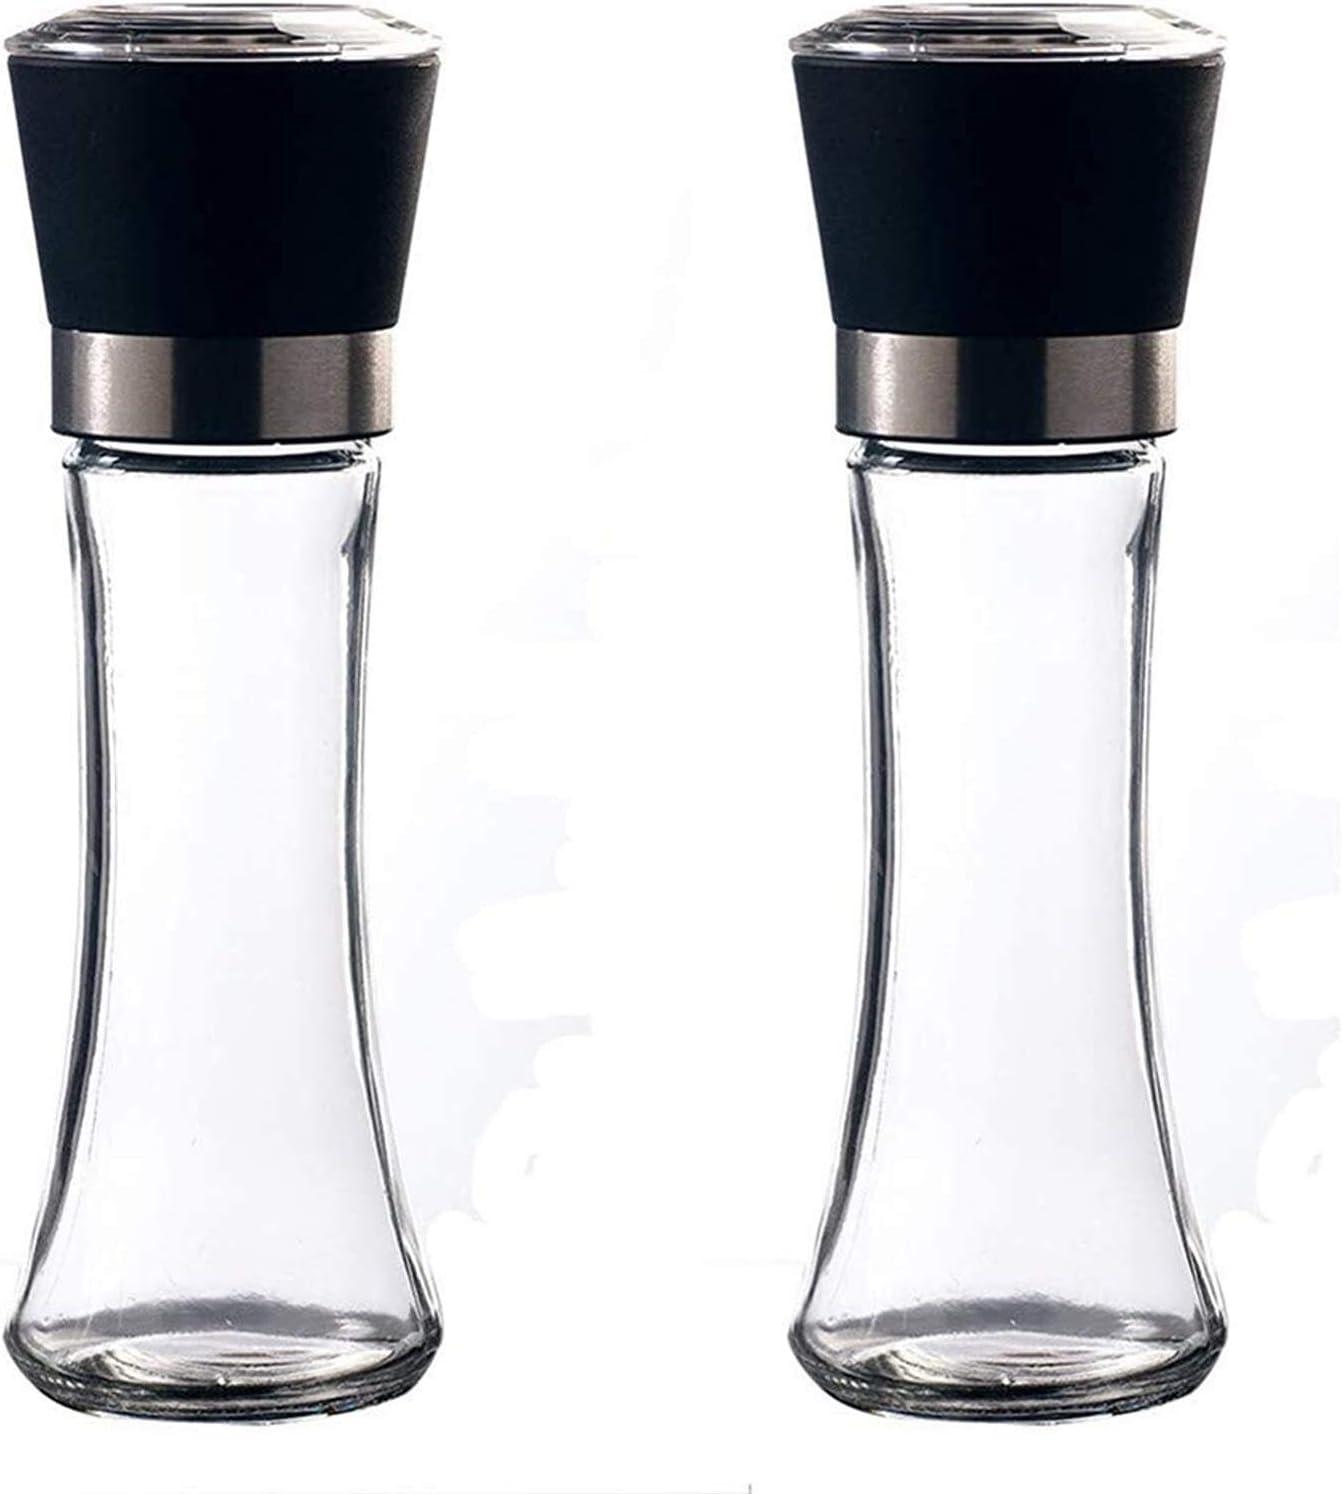 Salt Award-winning store Popular products and Pepper Grinder Professional Mechanisms Precision Set